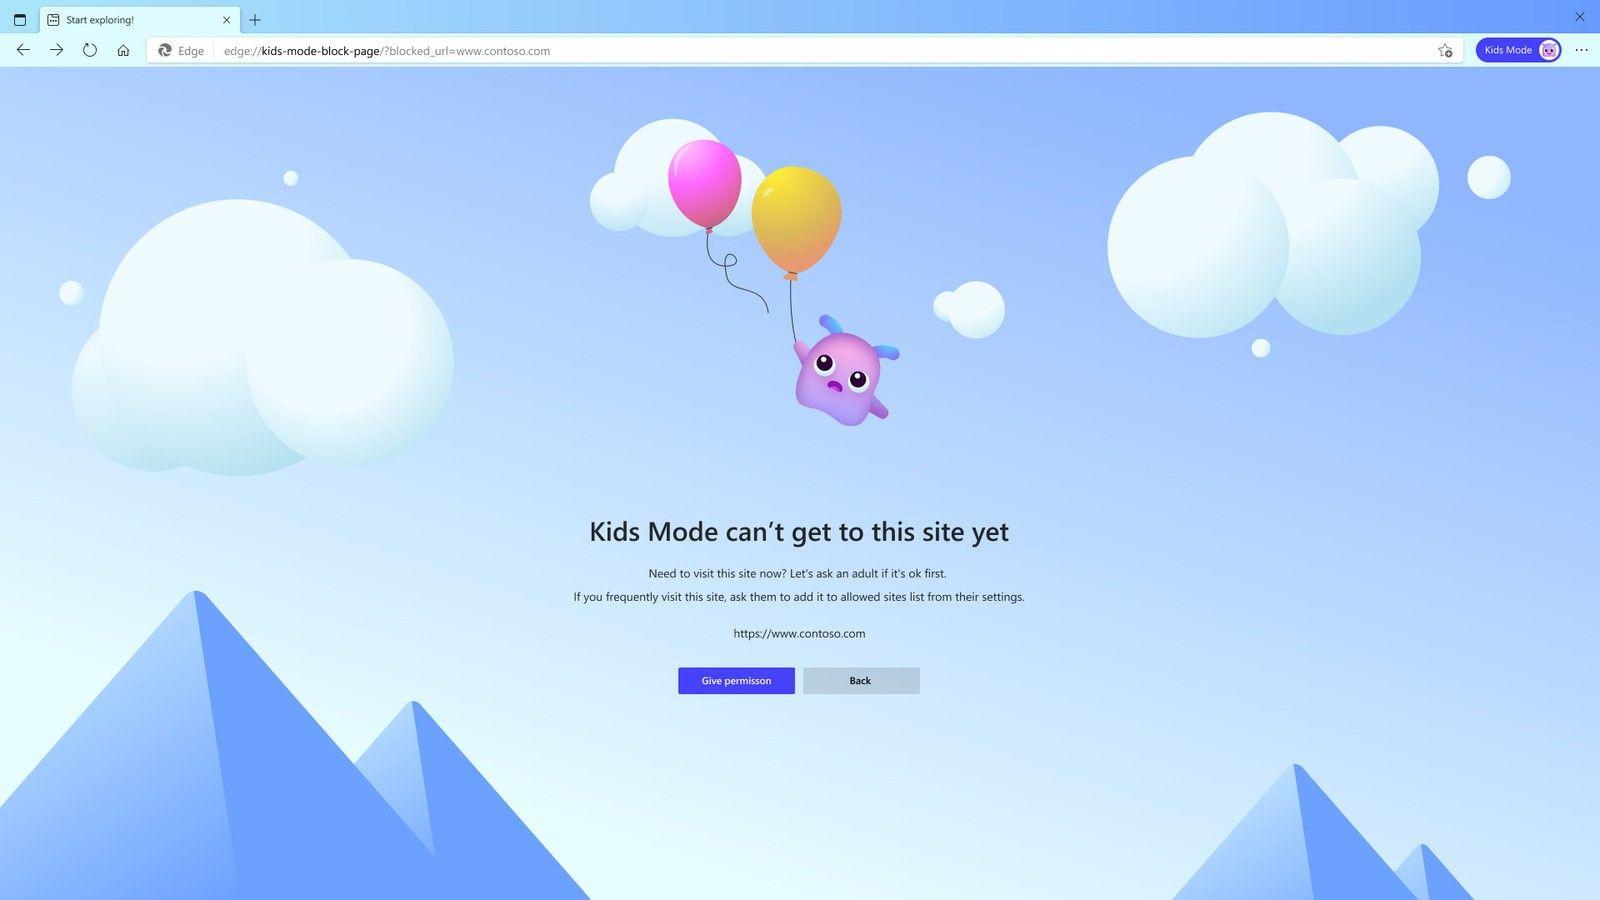 kids-mode-blocked-site.jpg